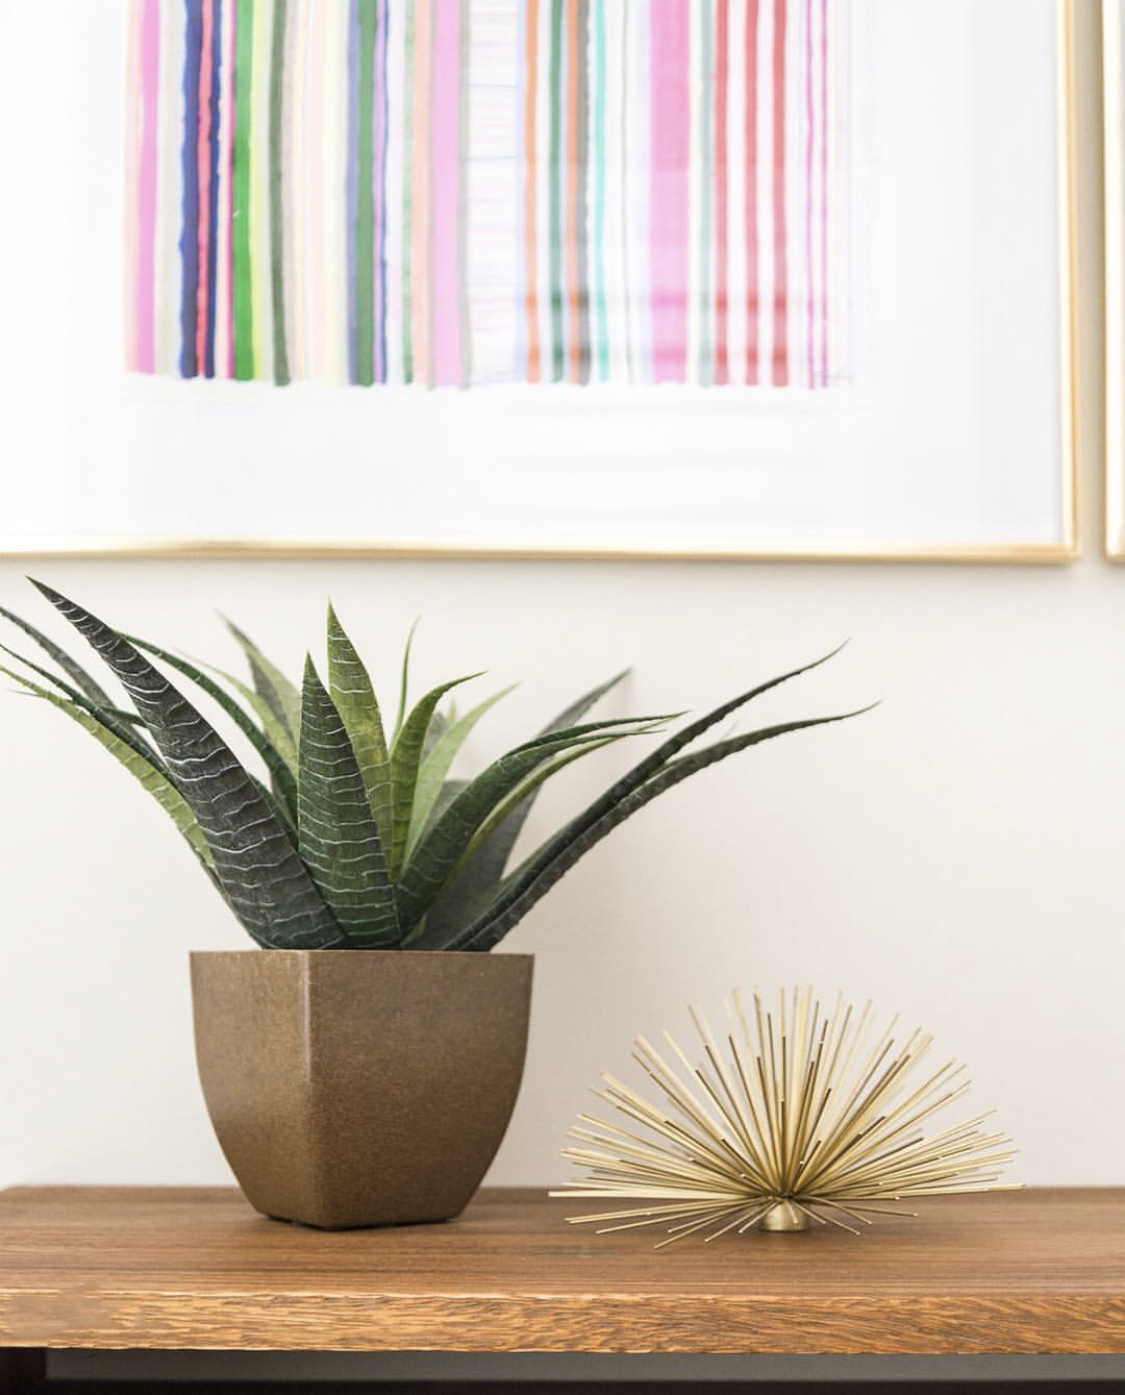 Kristi-Kohut-fine-art-in-homes-collector-reviews672.jpg